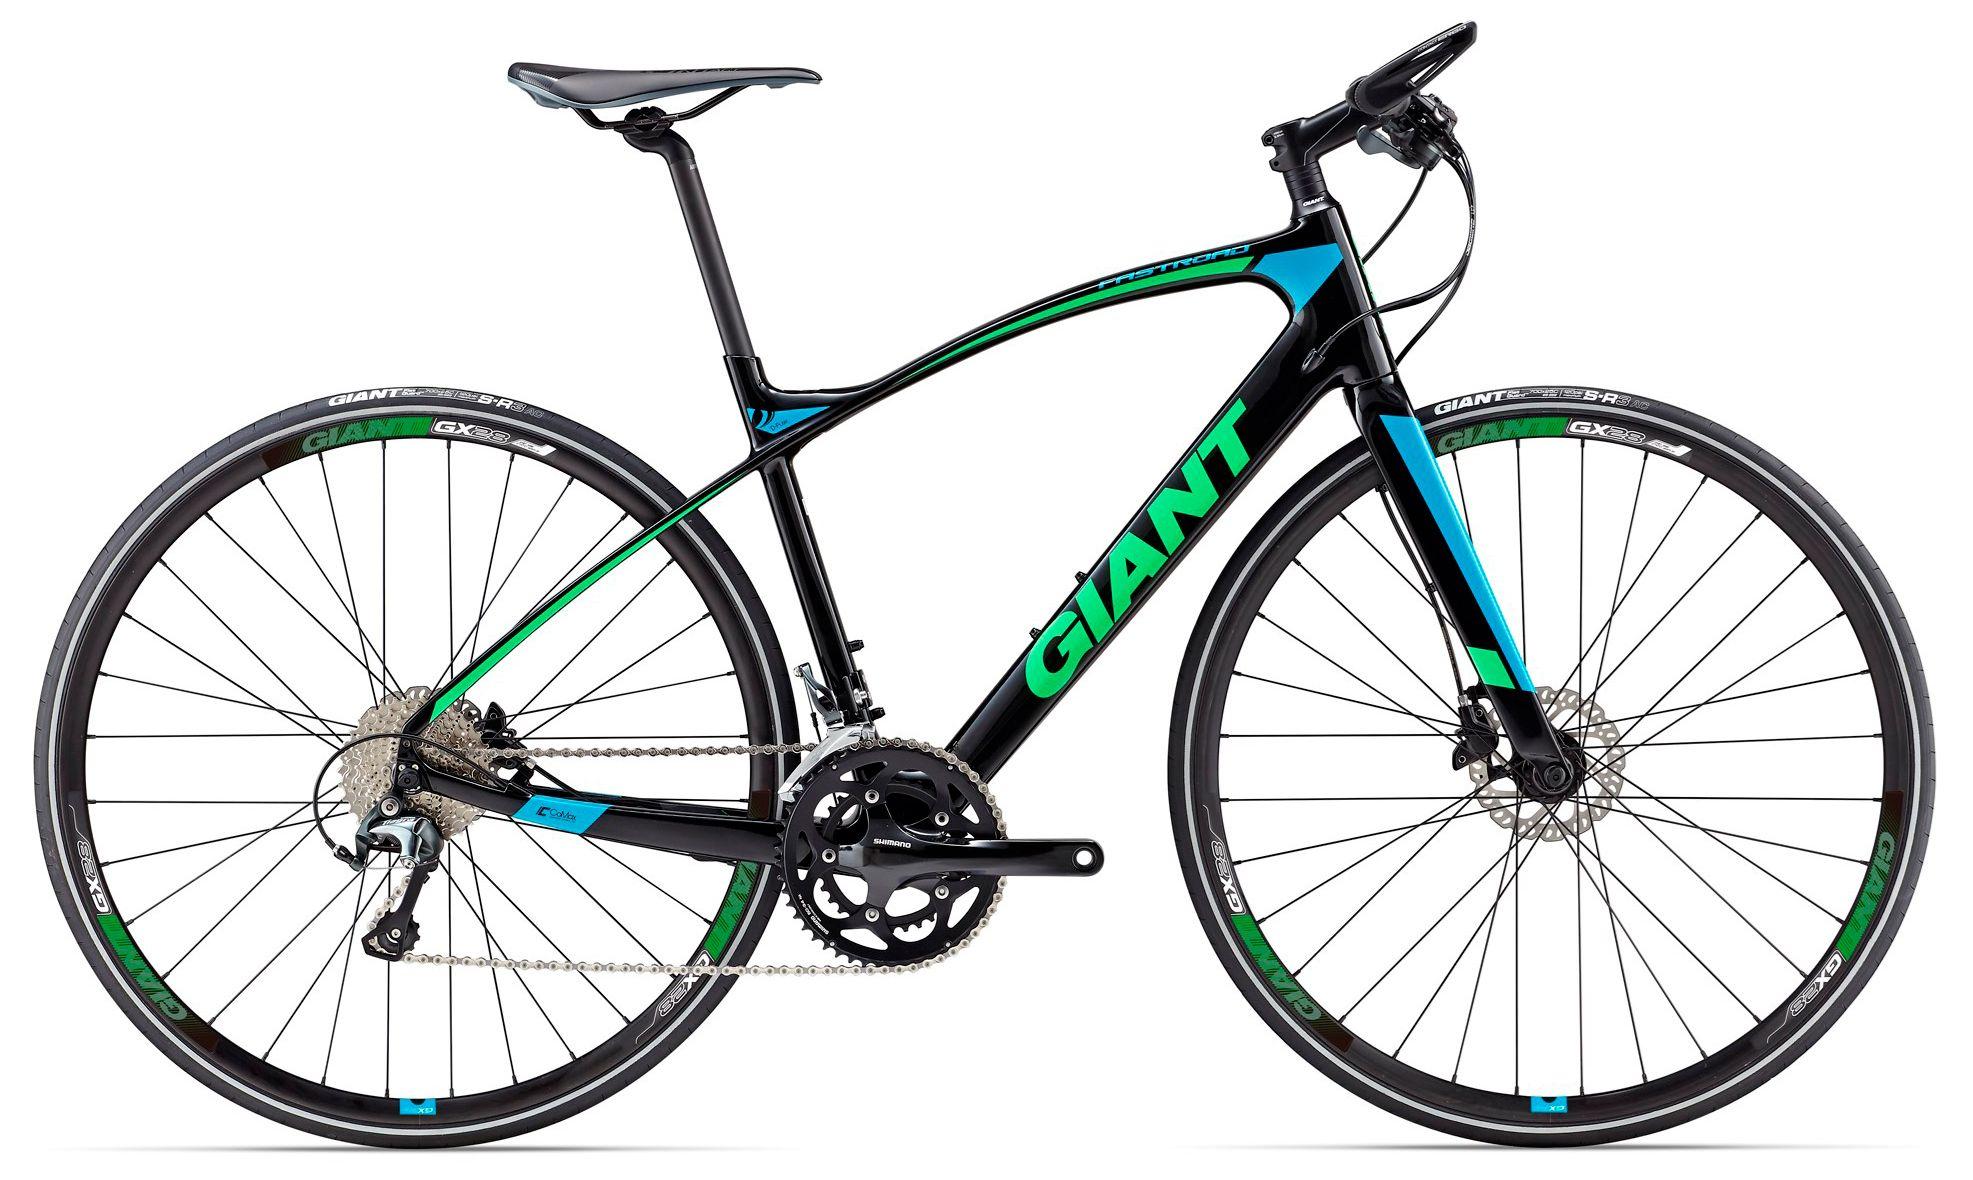 цена на Велосипед Giant FastRoad CoMax 2 2017